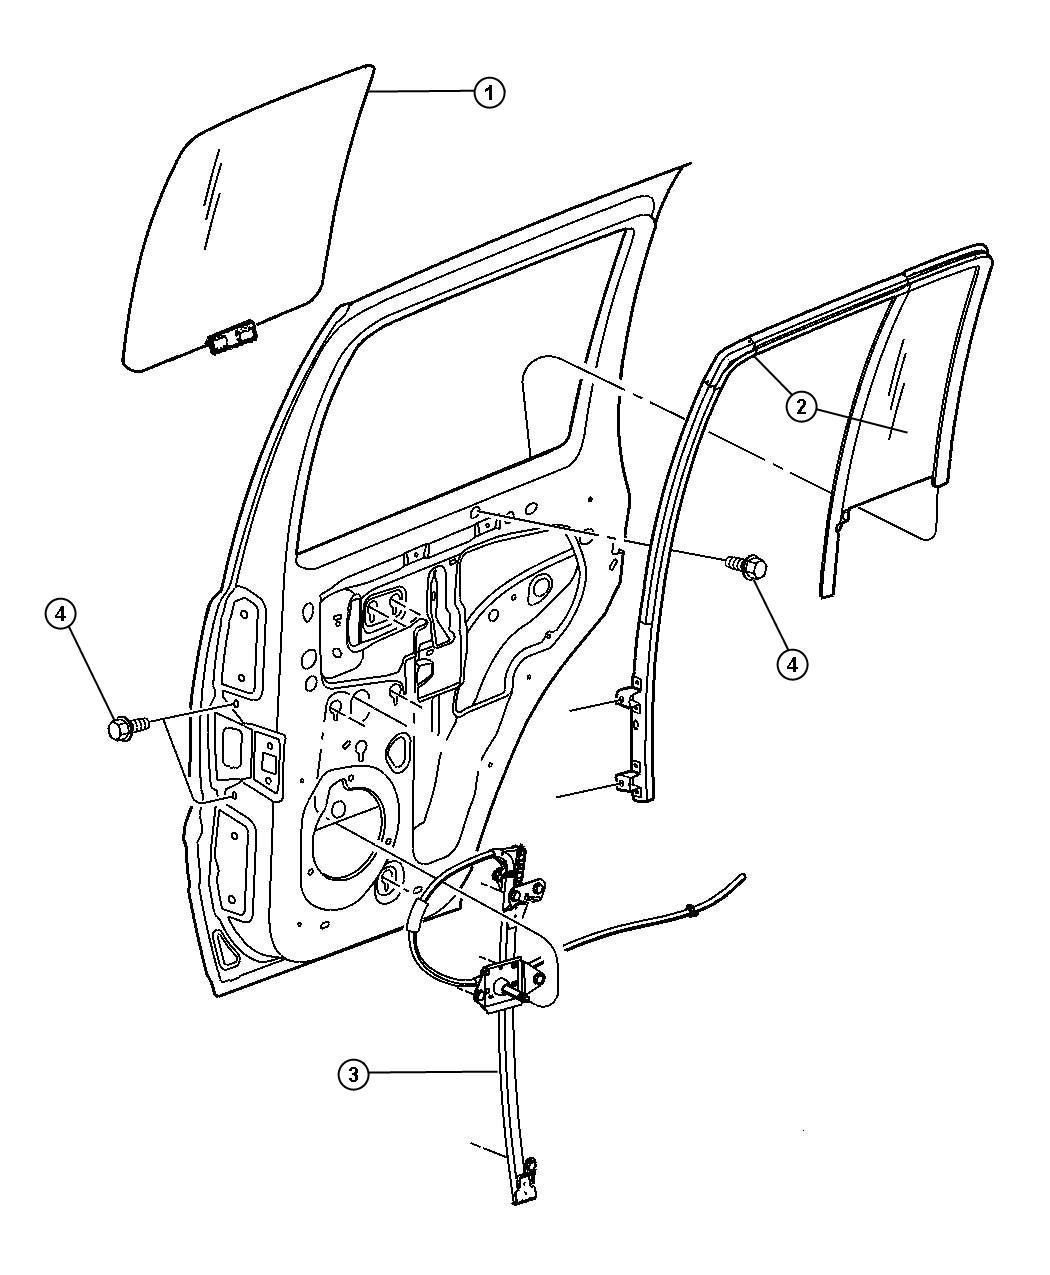 2011 dodge ram 4500 regulator  rear door window  after 2  25  2006  with  pwr windows  drvr and